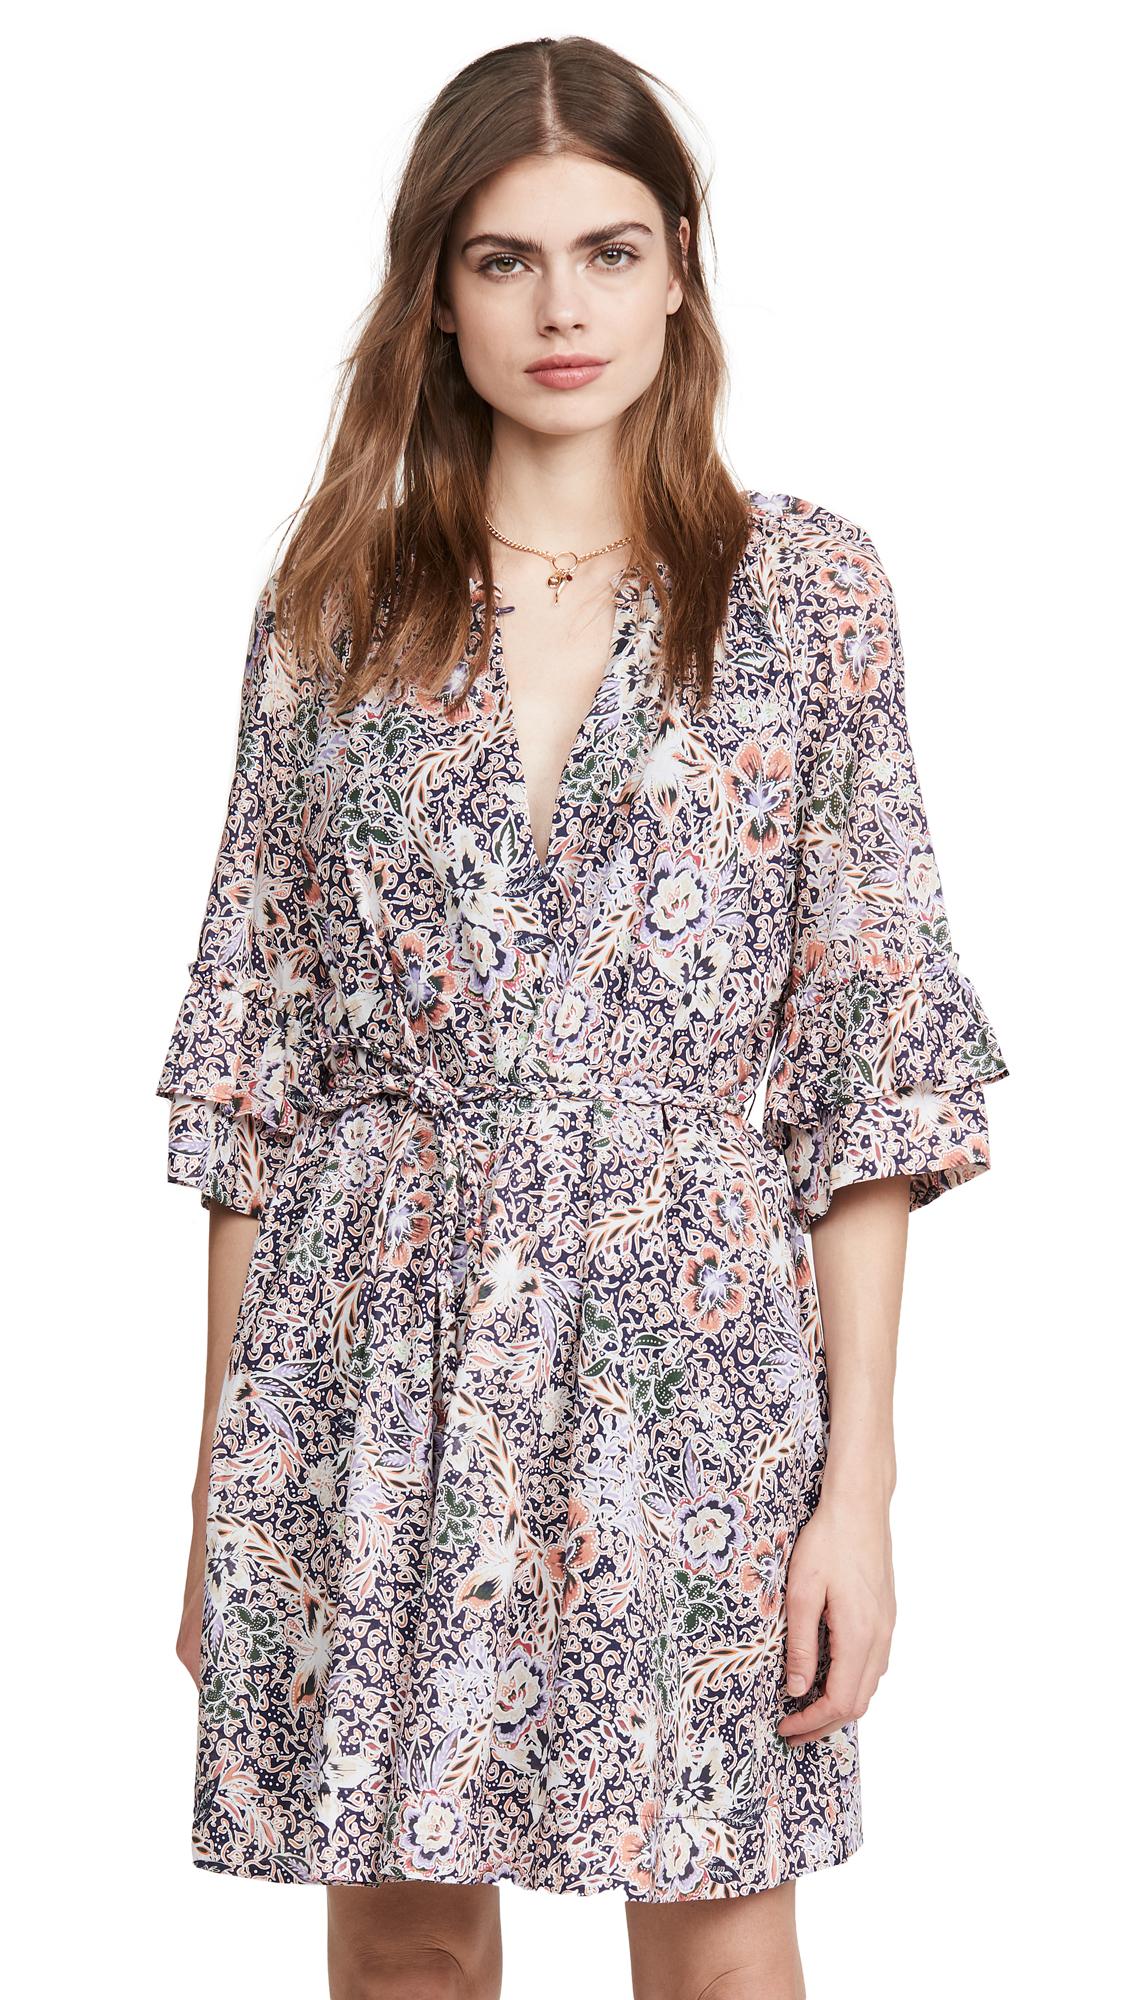 Rebecca Minkoff Serafina Dress - 30% Off Sale